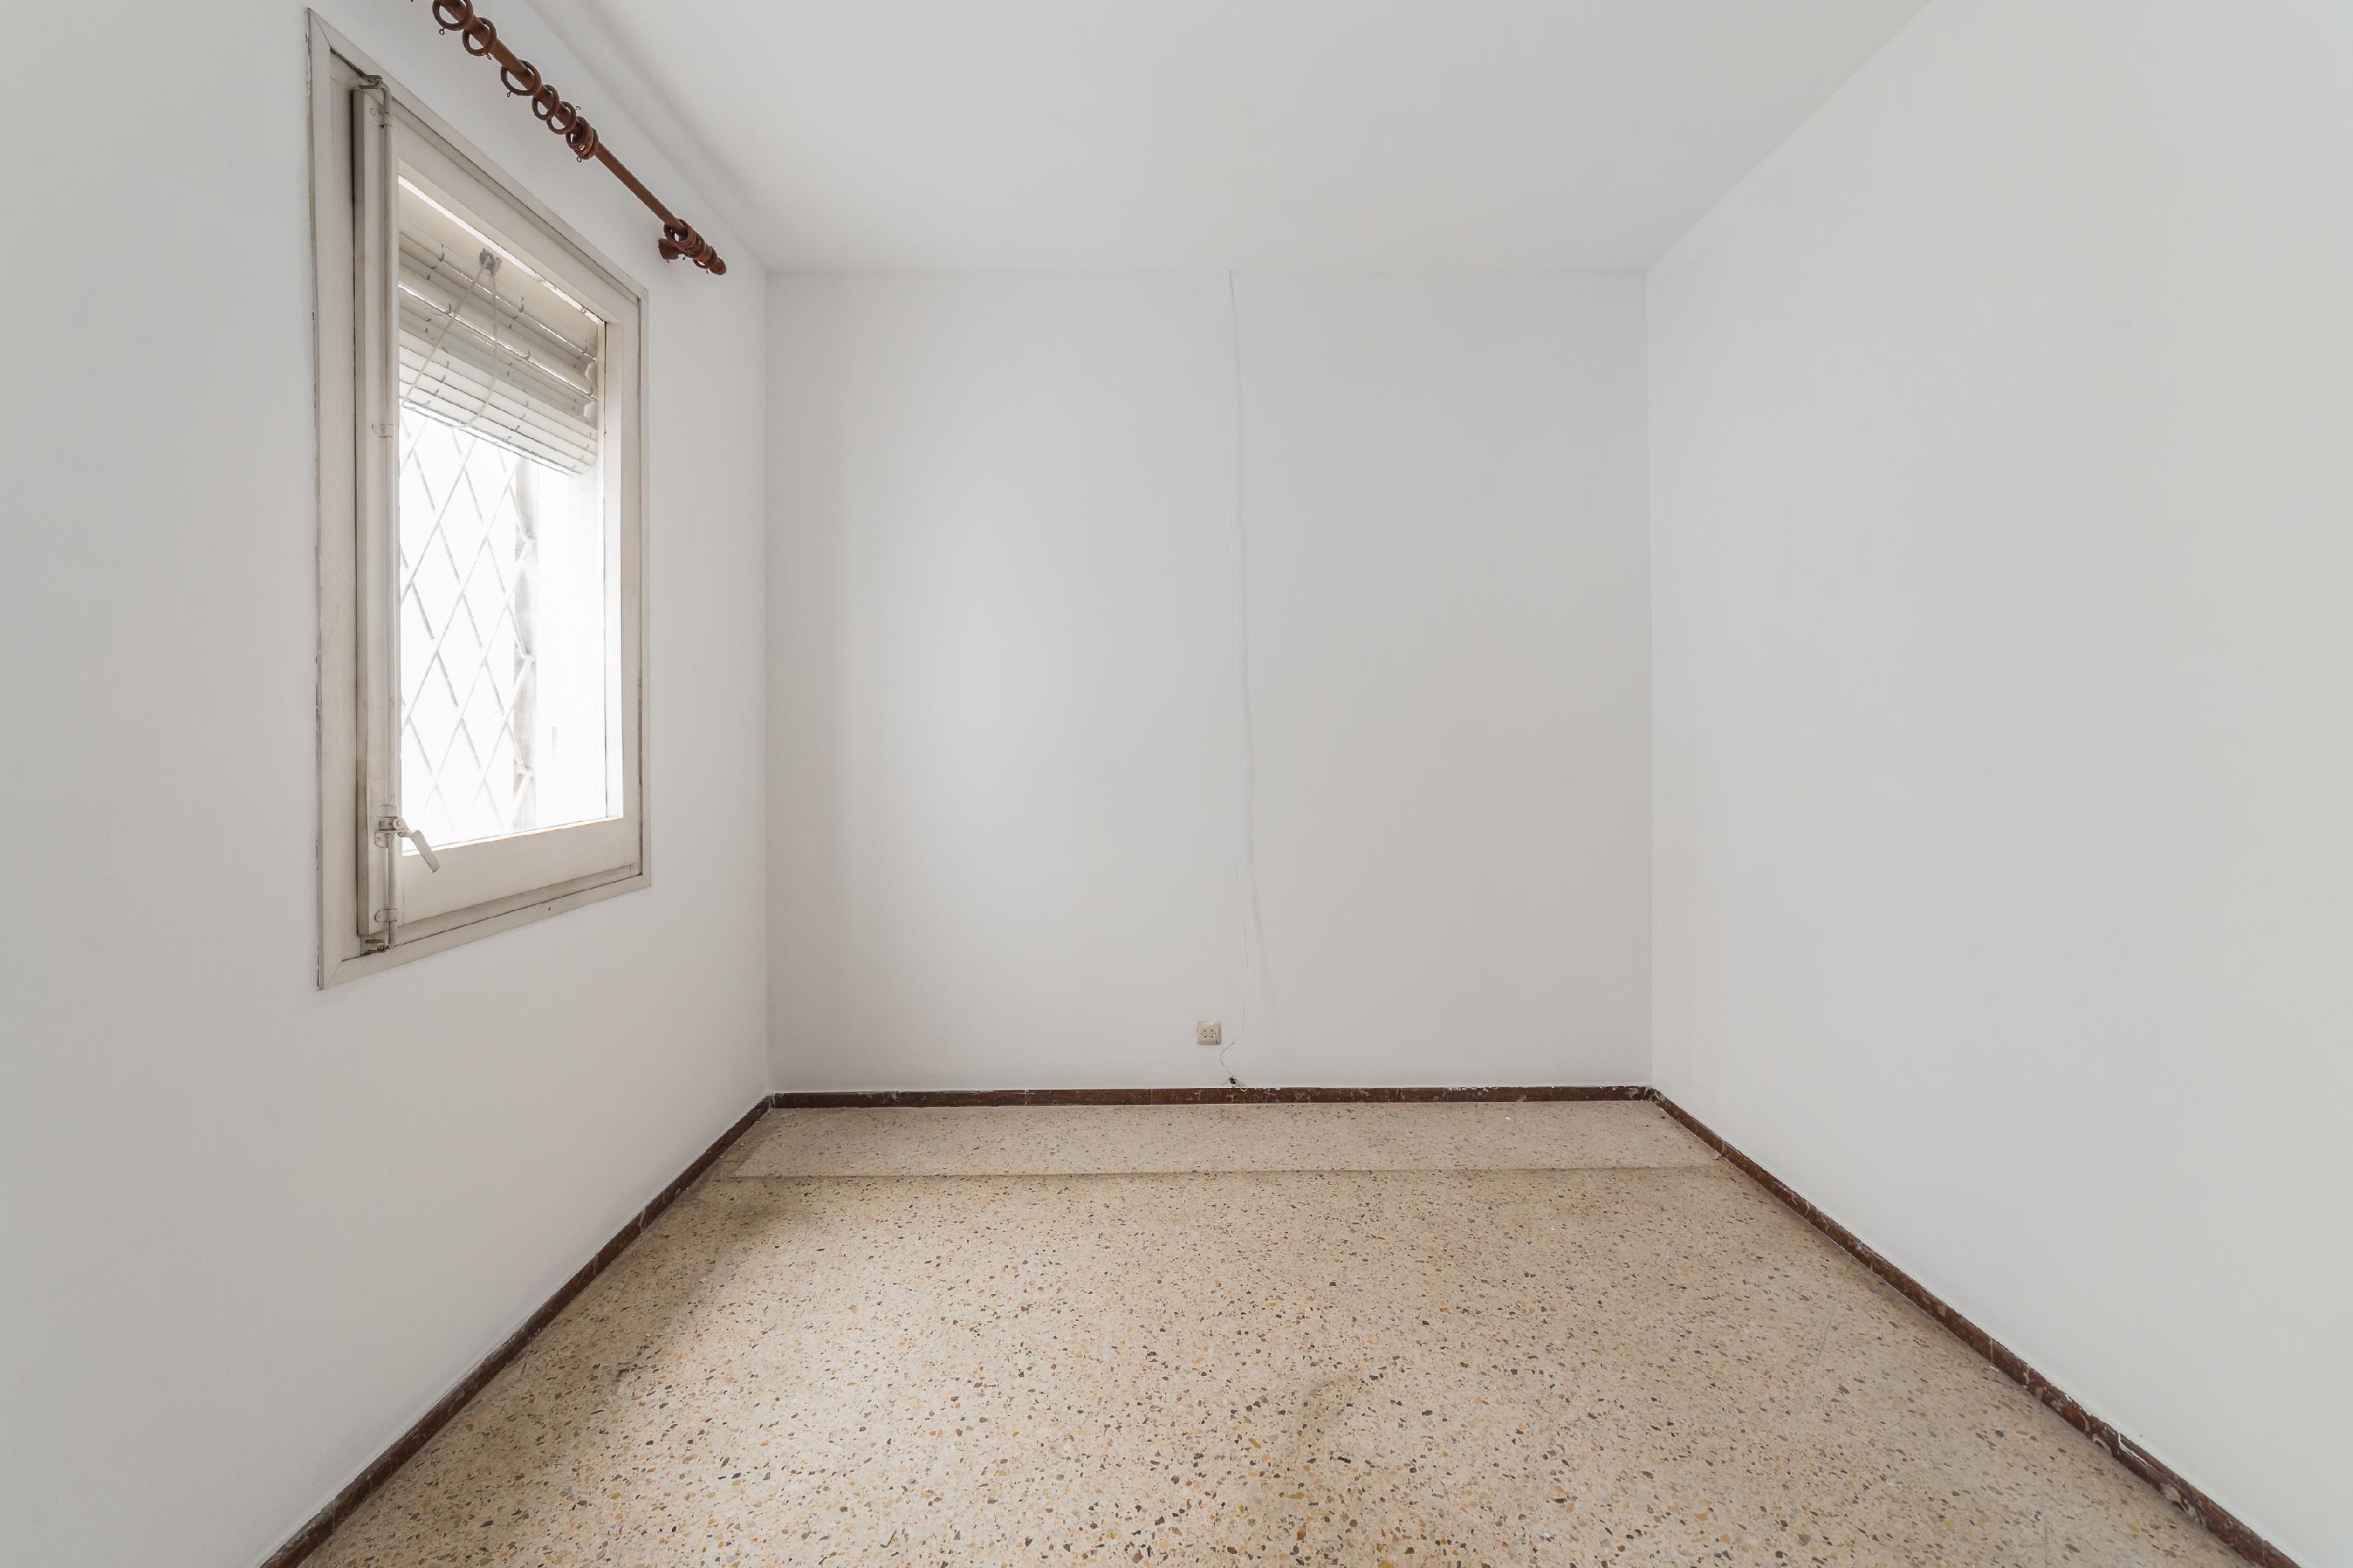 247624 Flat for sale in Eixample, Sant Antoni 20